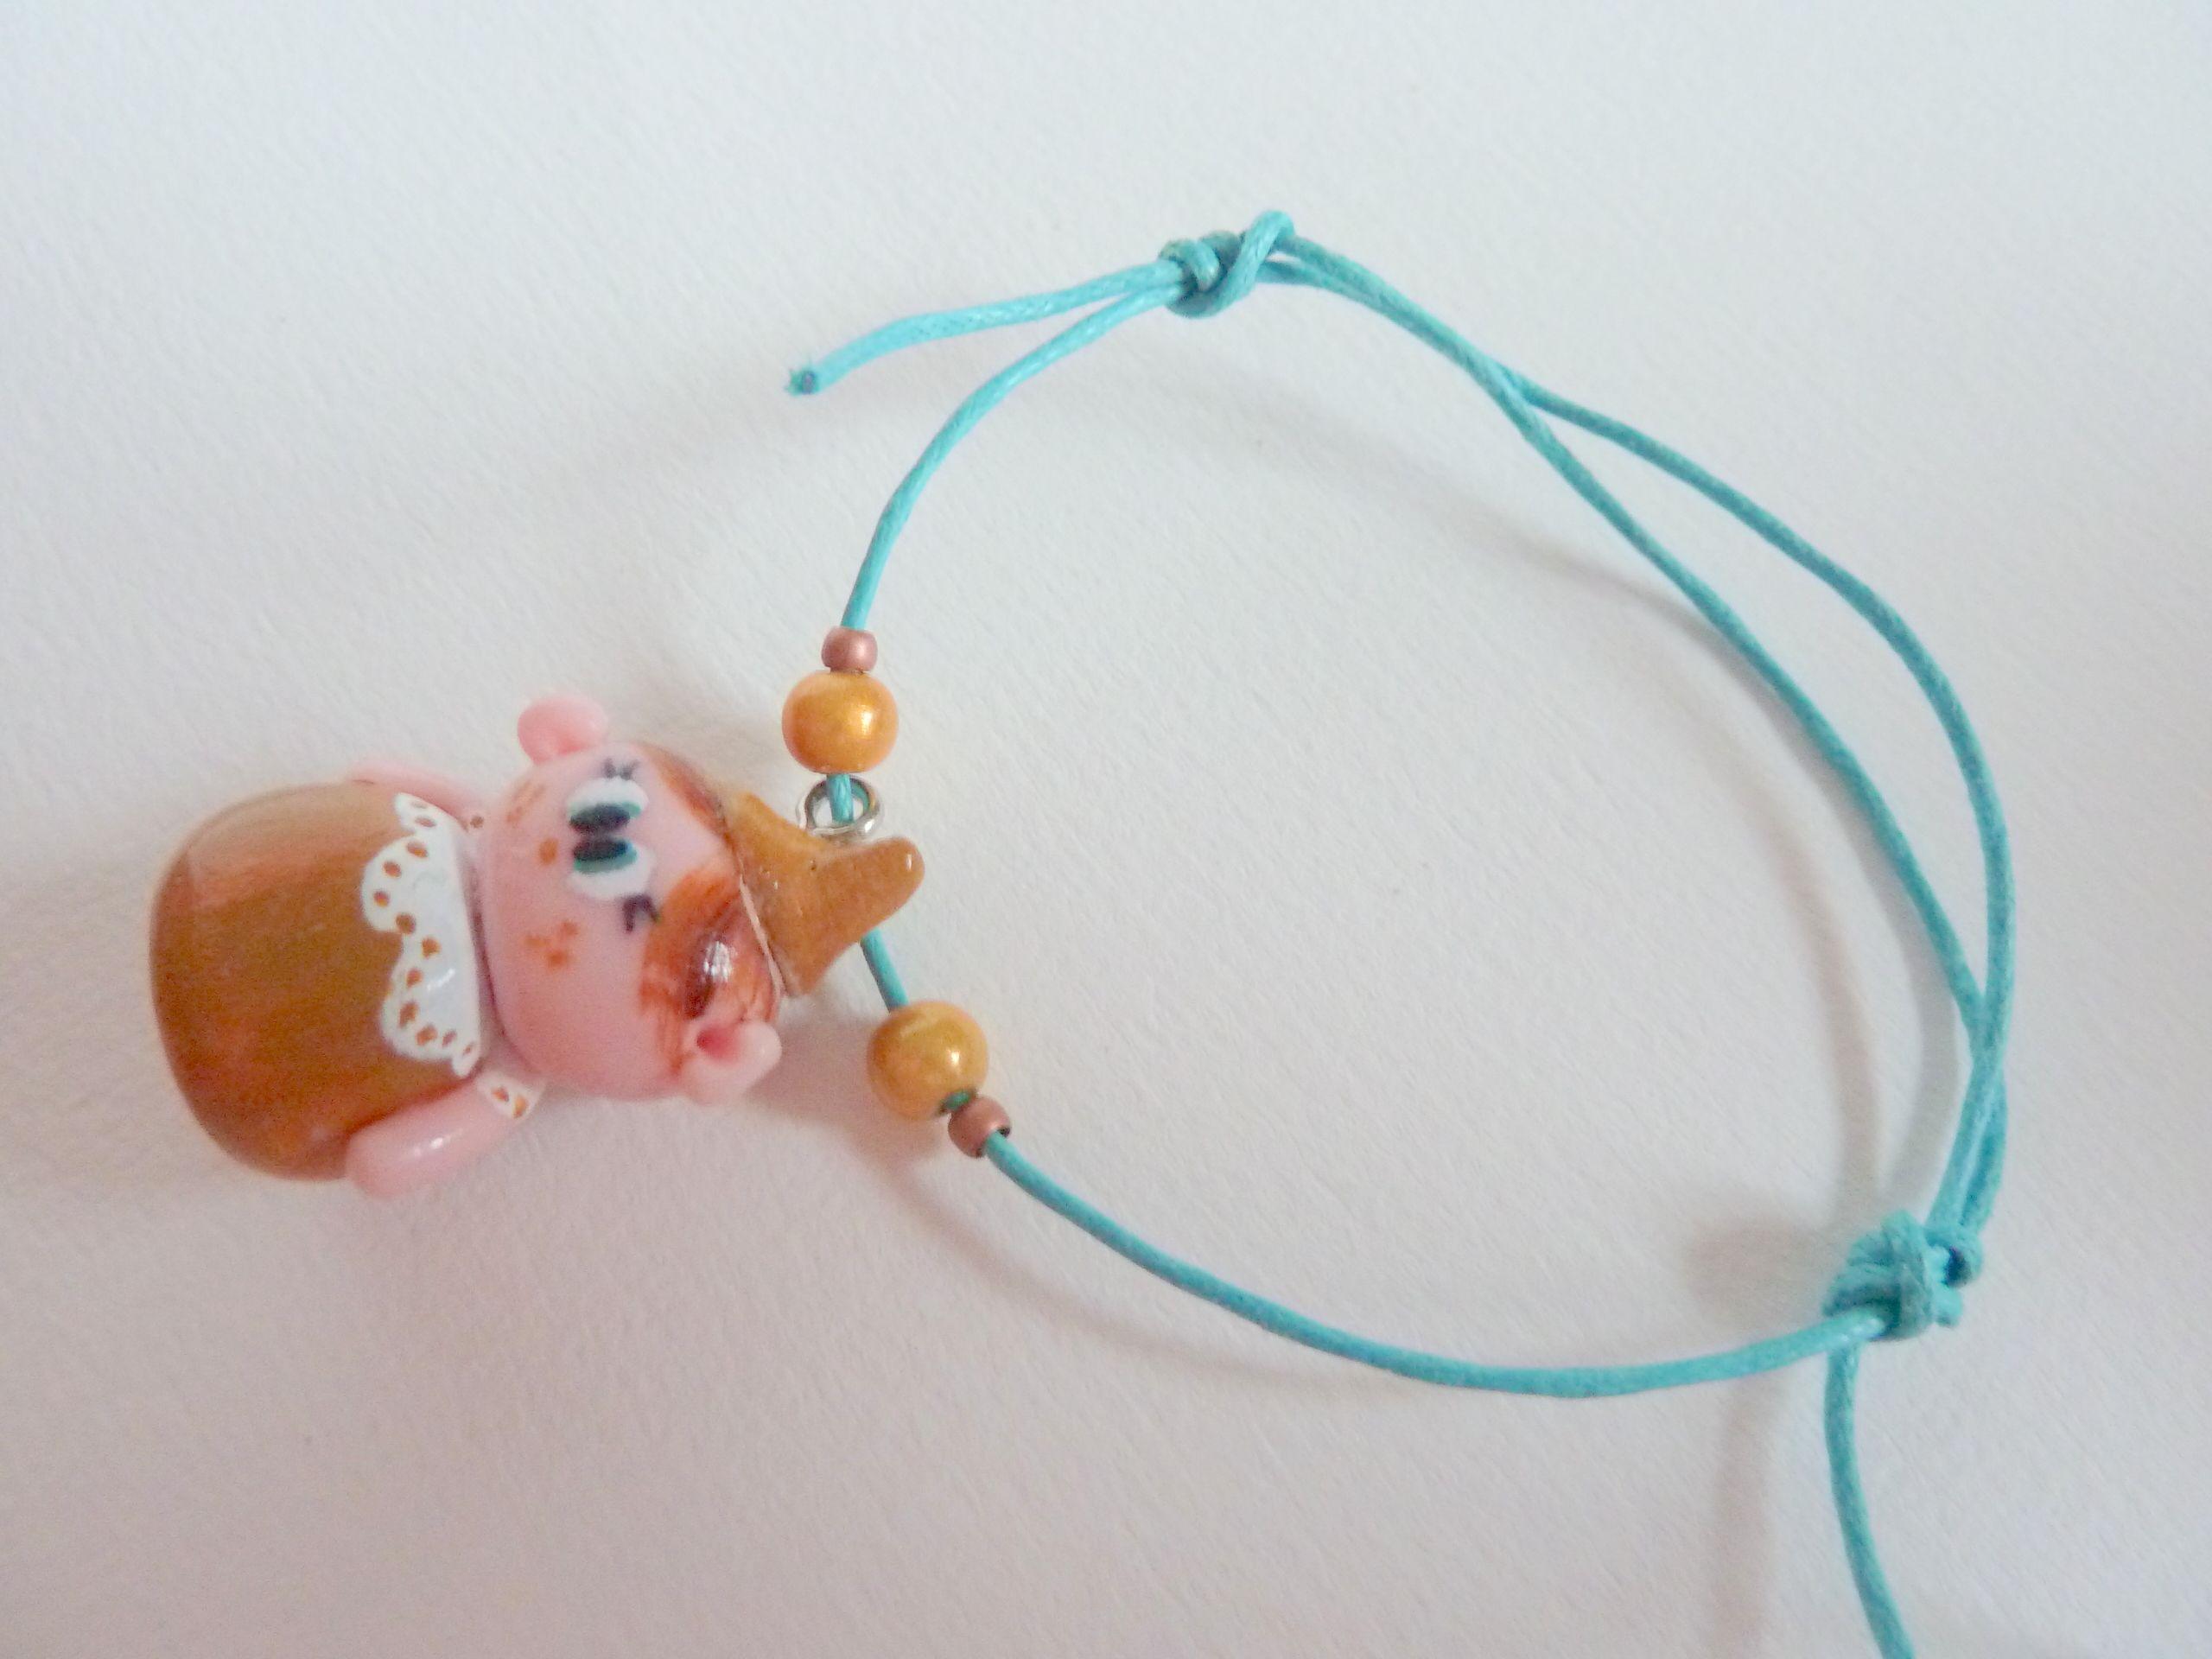 image du bracelet